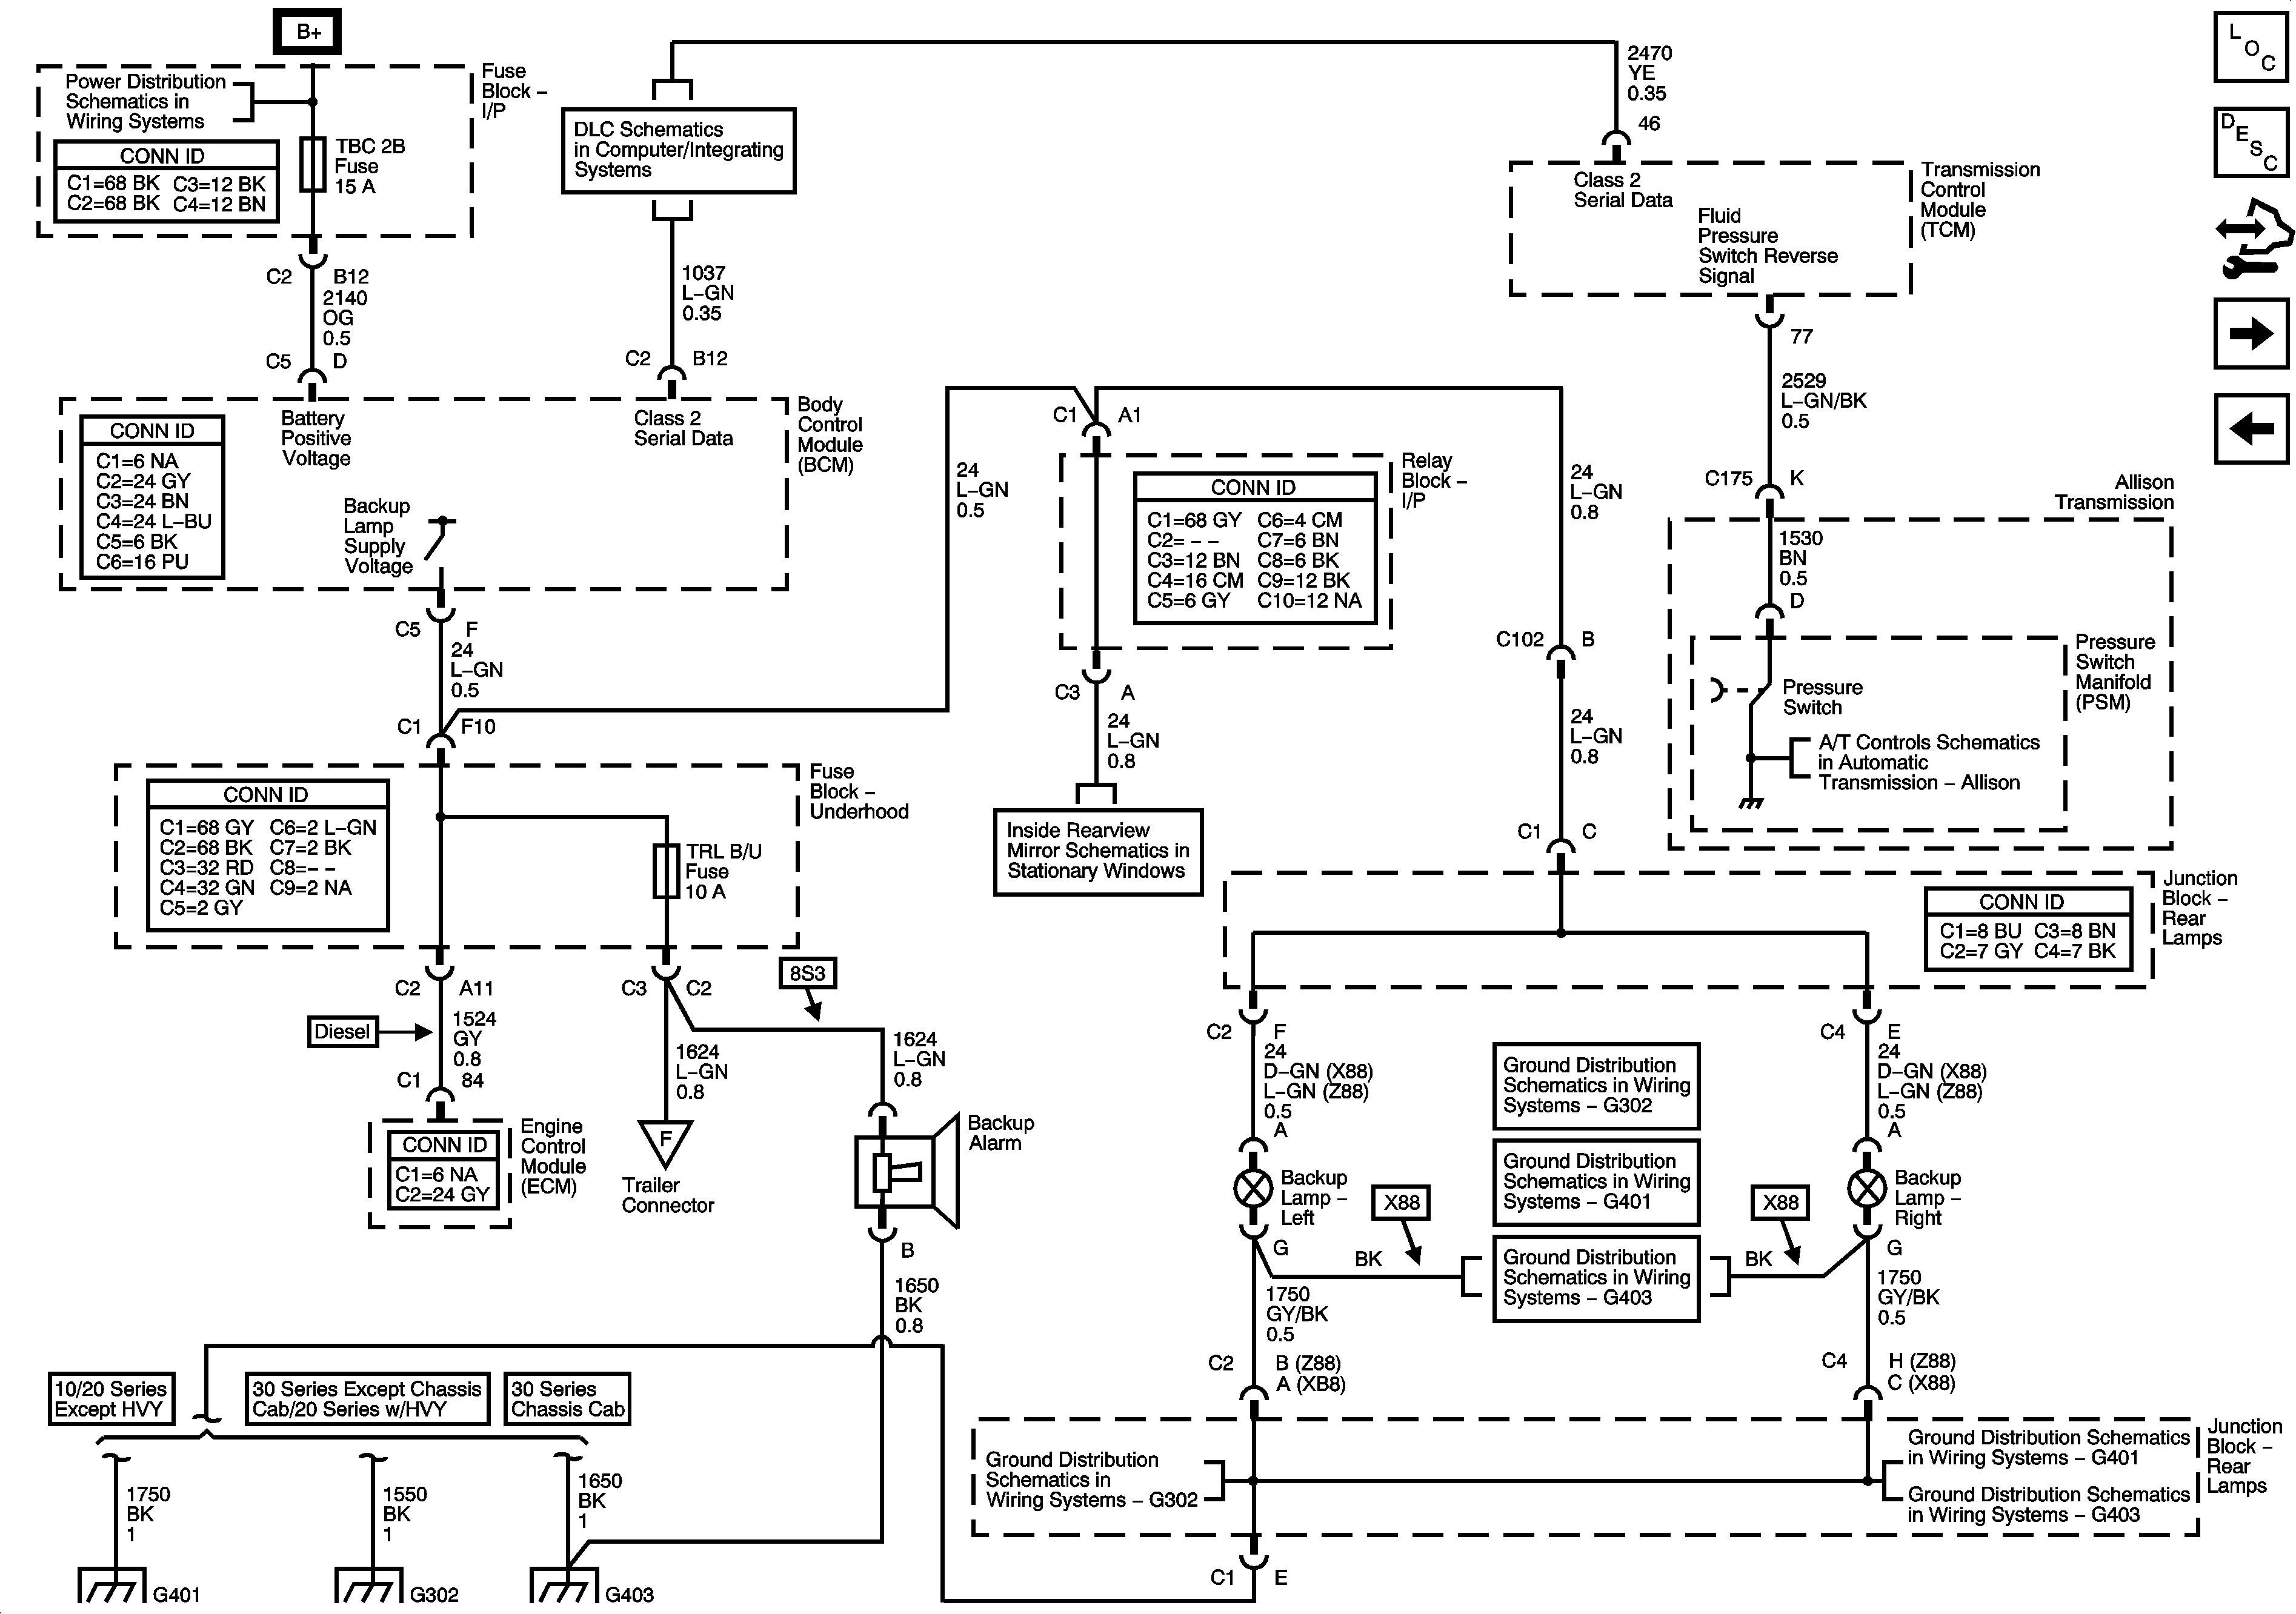 1984 Chevy Truck Wiring Diagram Chevy Silverado Trailer Wiring Diagram 2018 2006 ford Expedition Of 1984 Chevy Truck Wiring Diagram